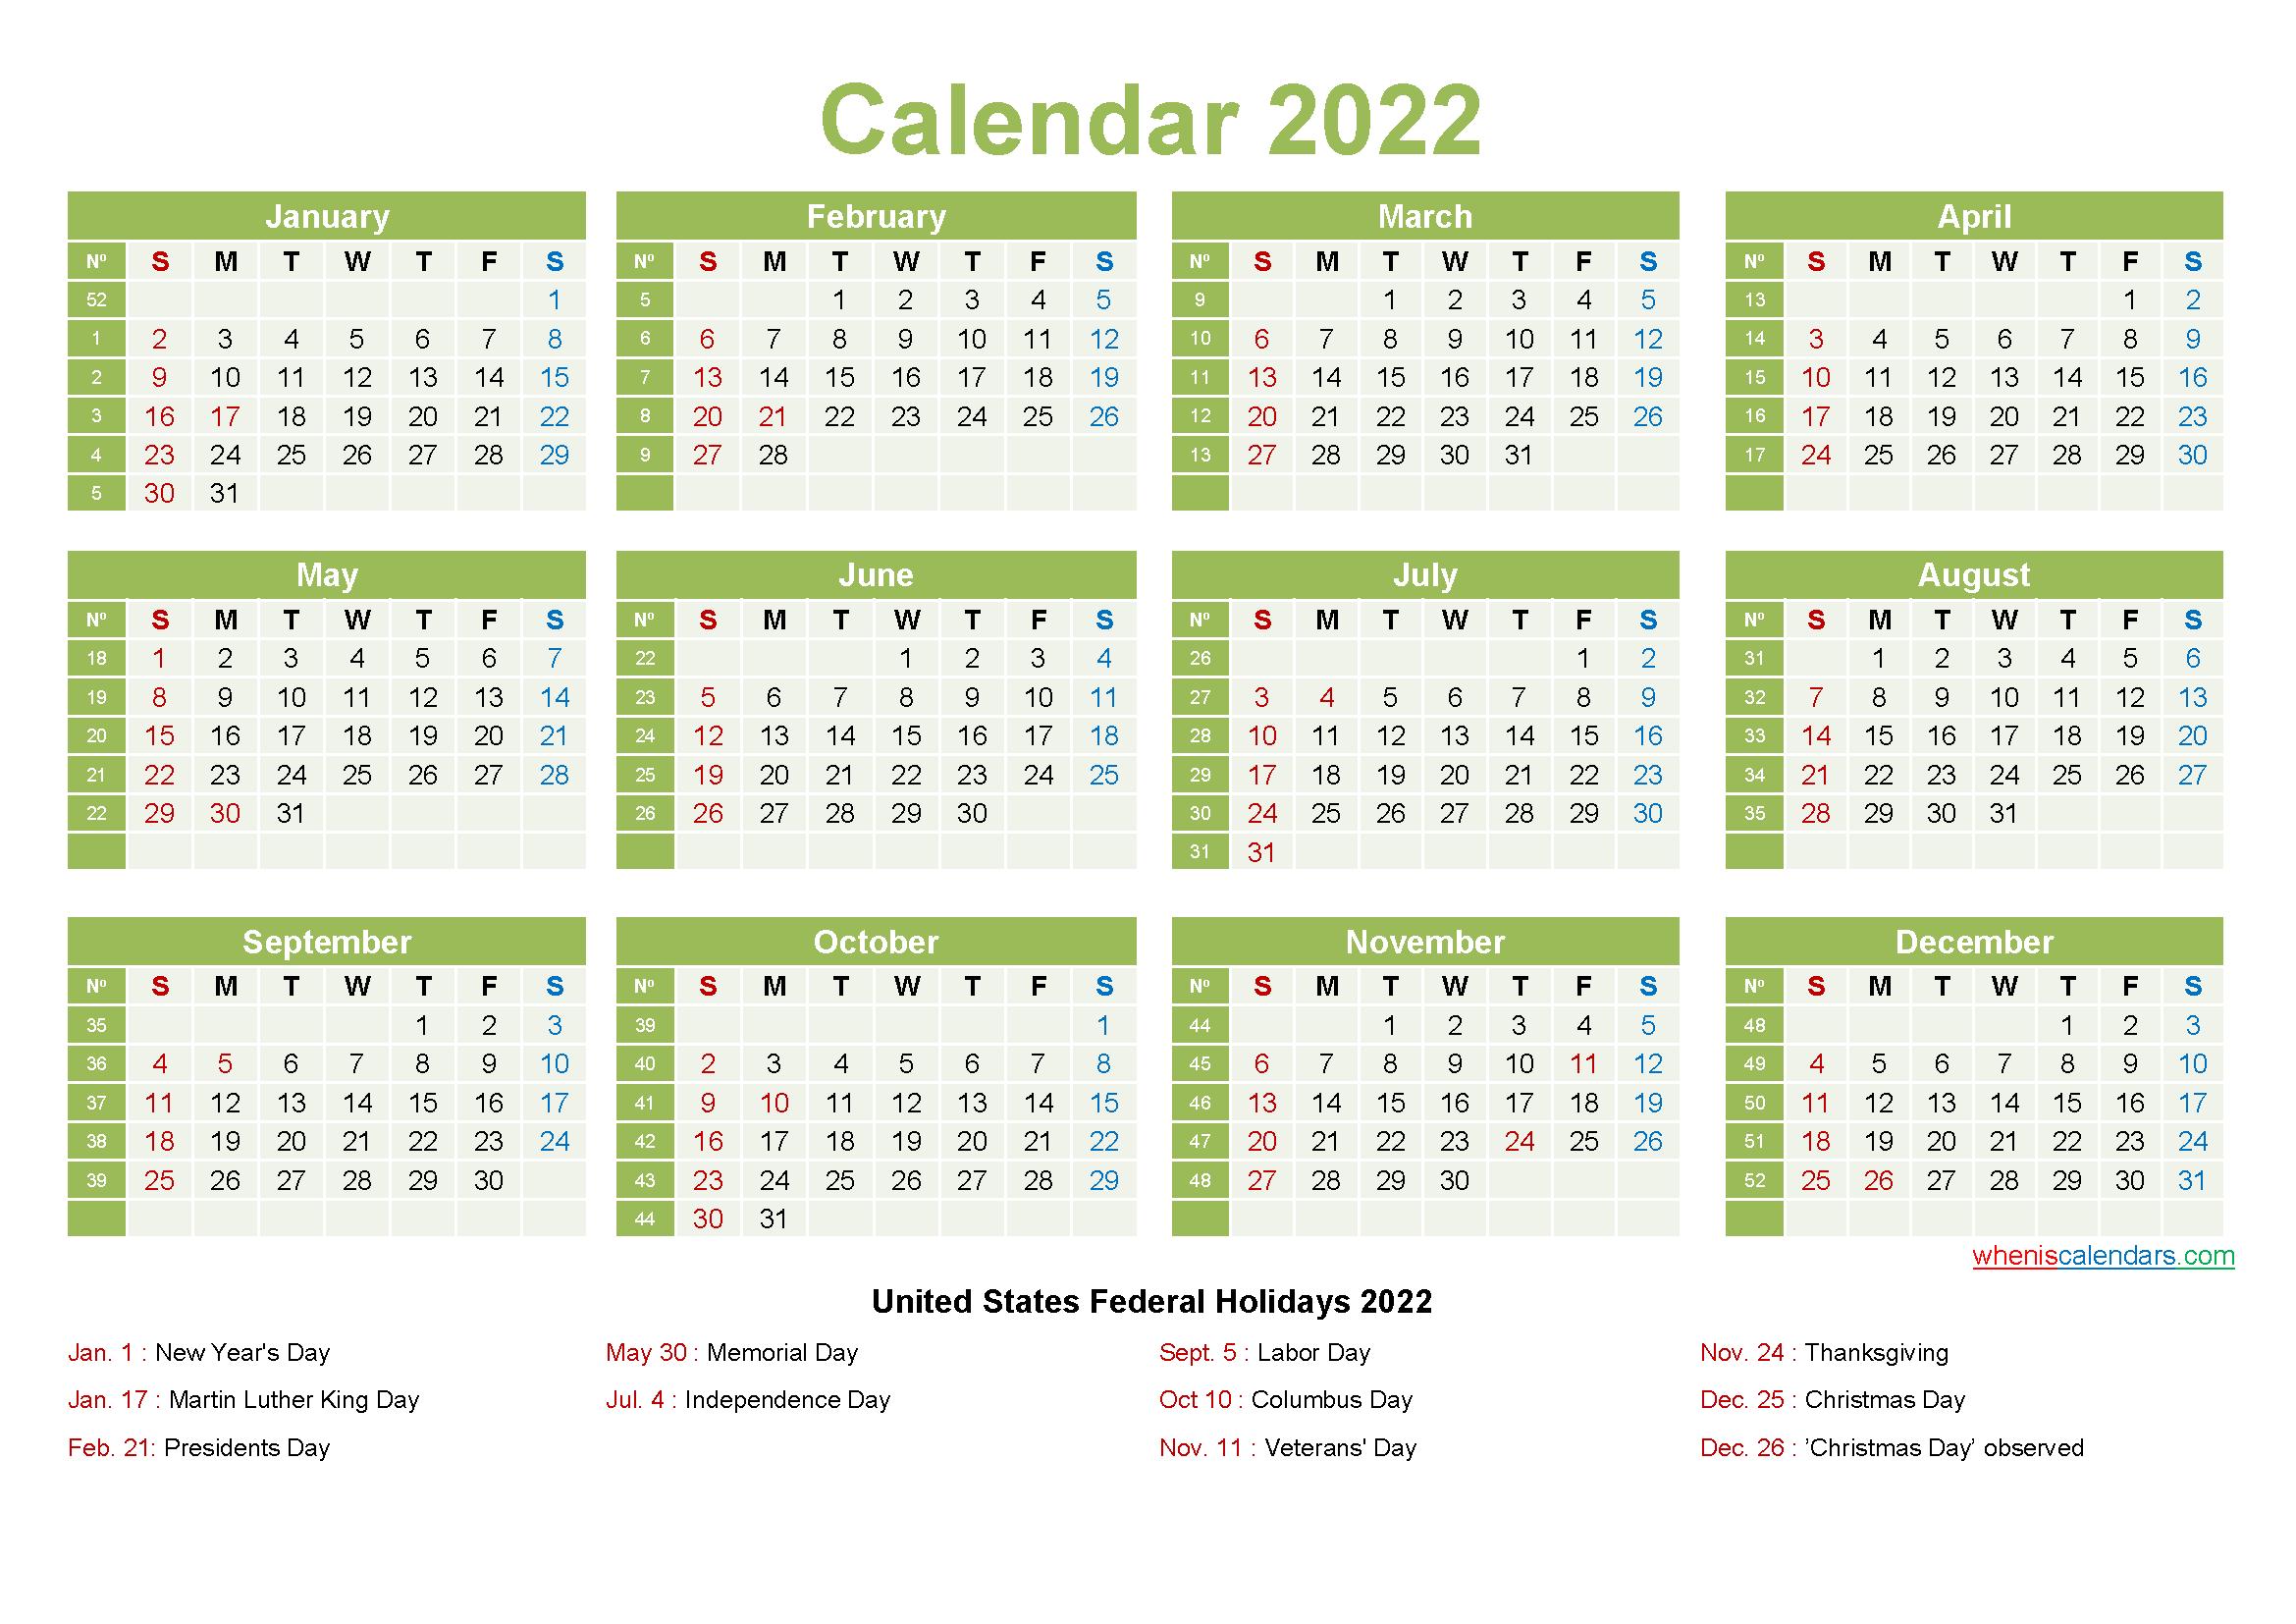 Free june 2022 calendar with holidays printable pdf and image. Printable Yearly 2022 Calendar with Holidays Word, PDF ...